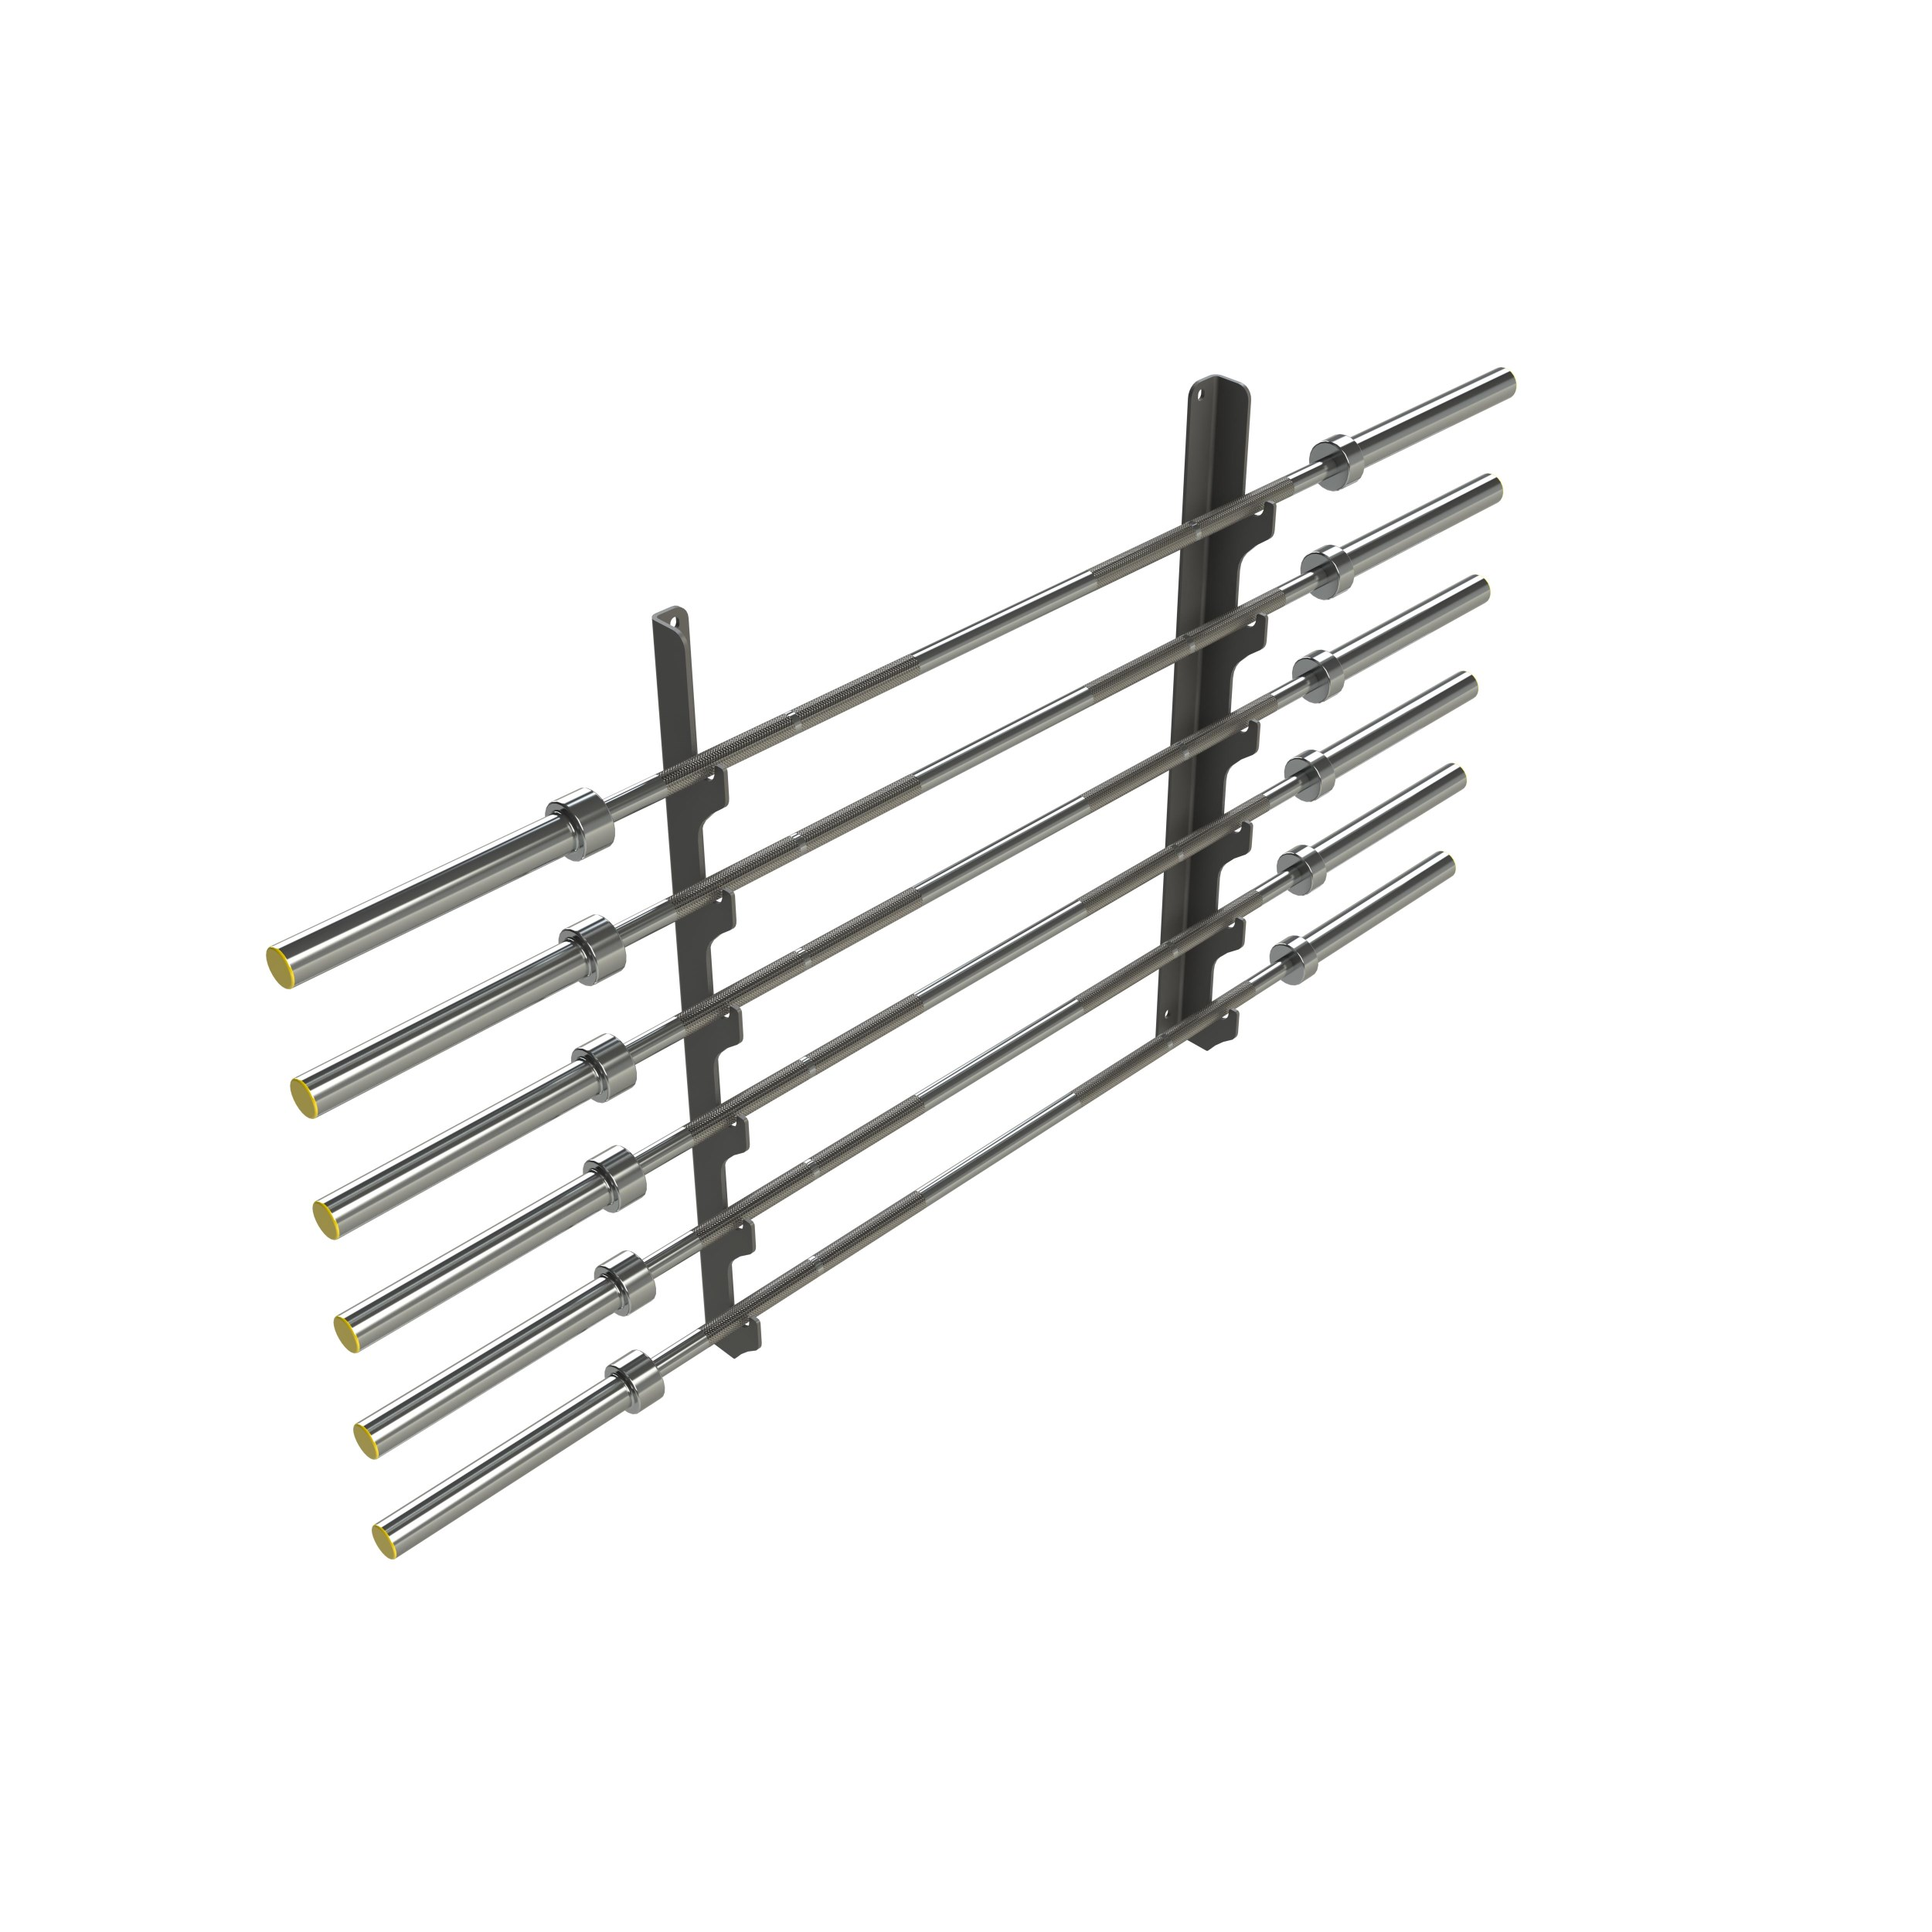 Horizontal Wall Gun Rack 6 Bars From Netfit